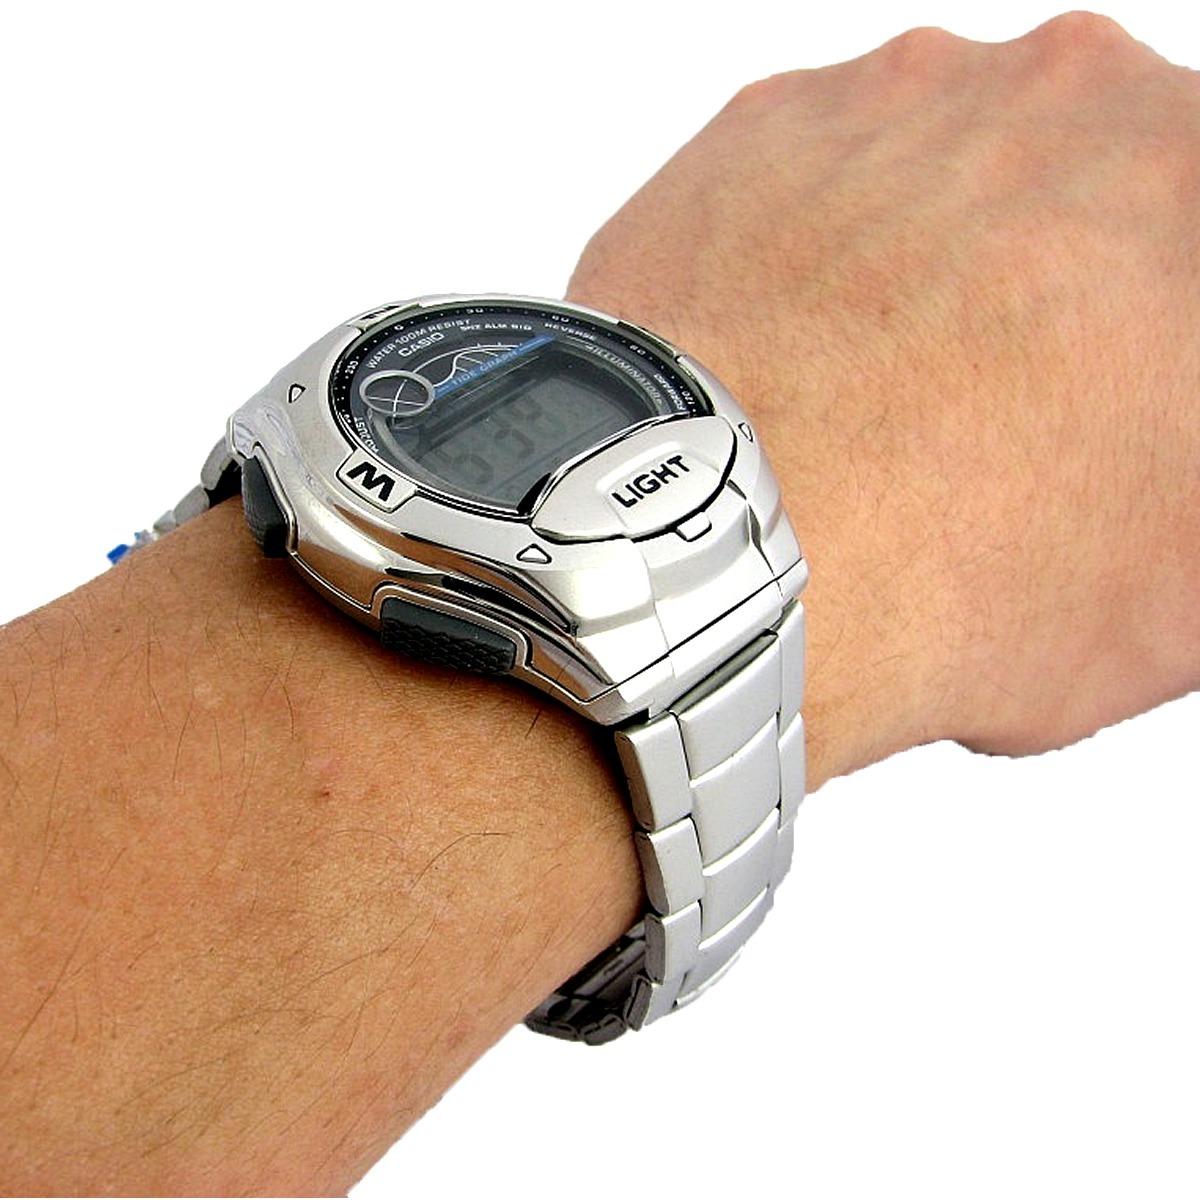 Relógio Masculino Digital Casio W-753d-1avdf - Prata - R  269,49 em ... ede8221697